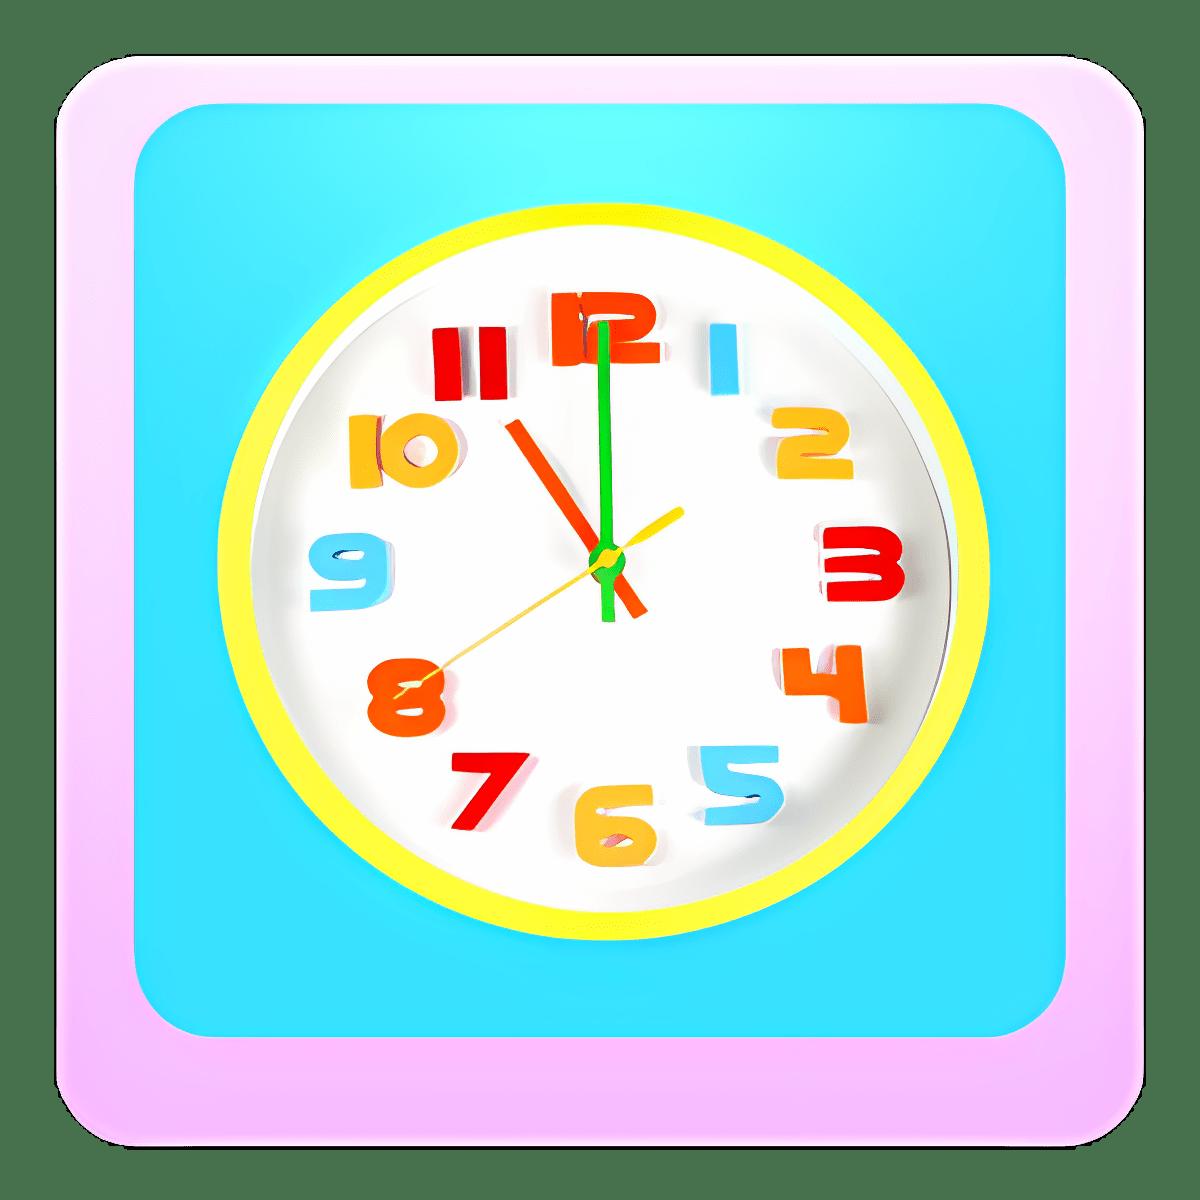 La Undécima Hora 2048